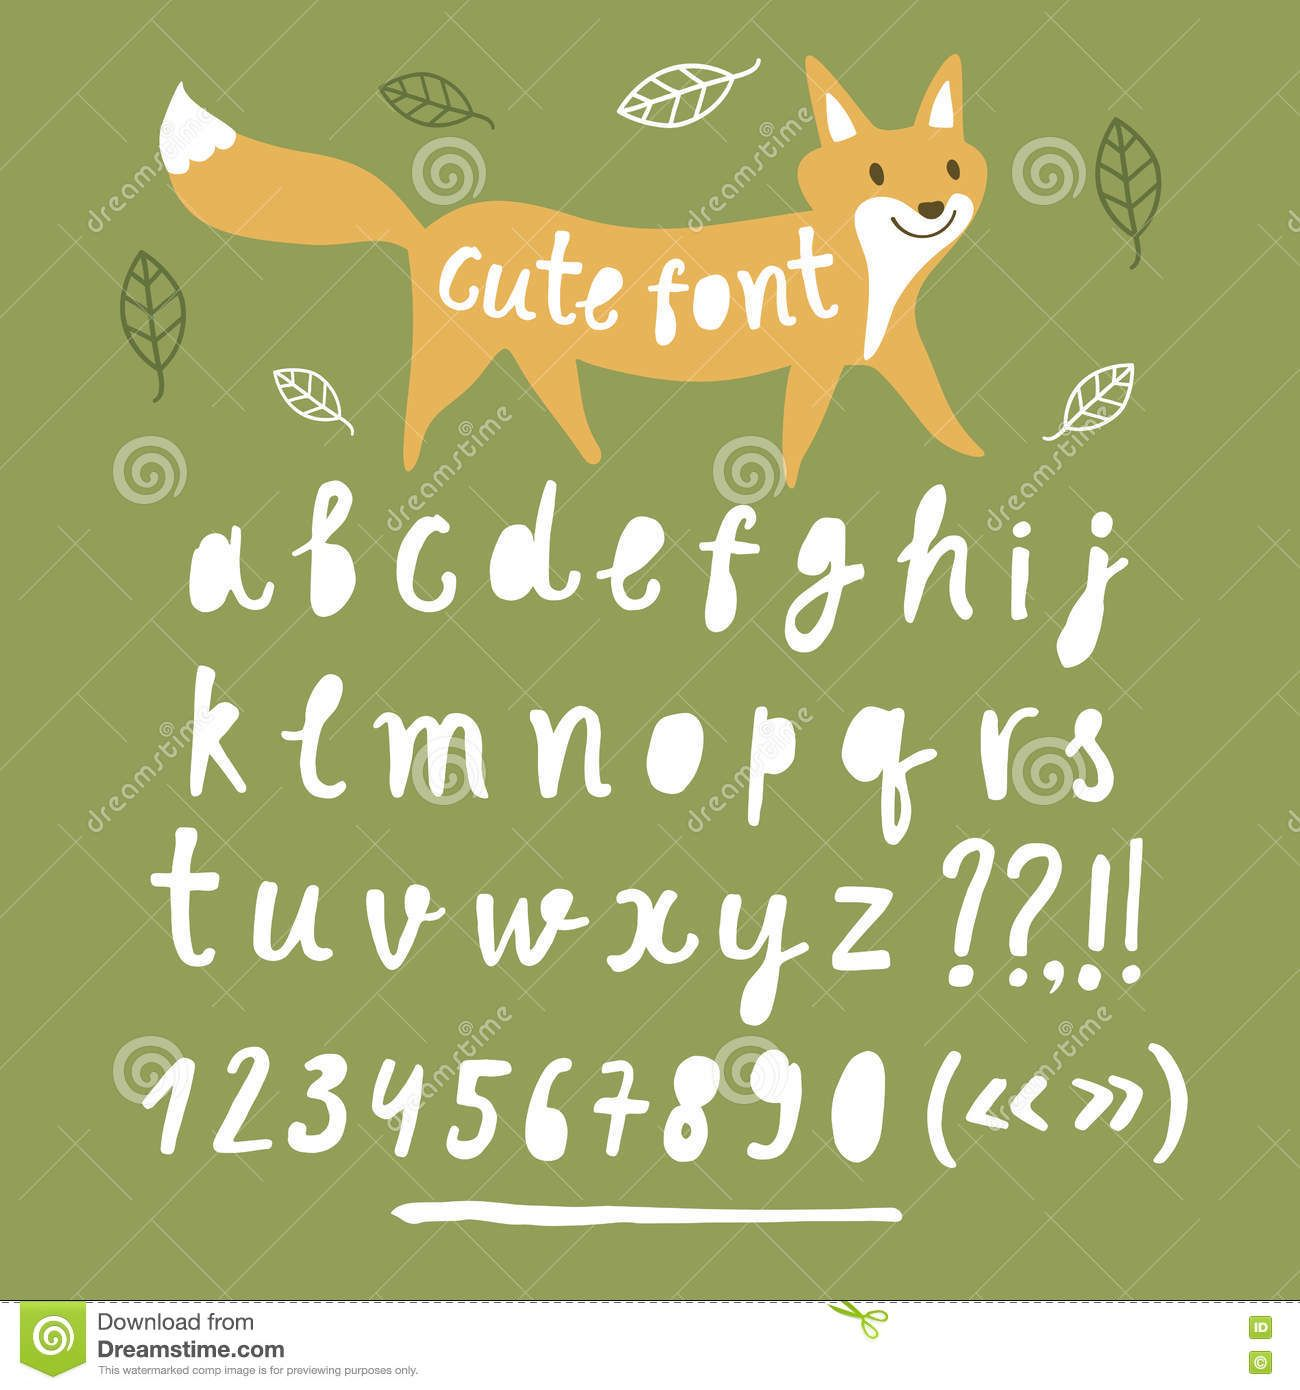 Brush Hand Drawn Vector Font With Cartoon Fox Stock Vector - Image: 72288816